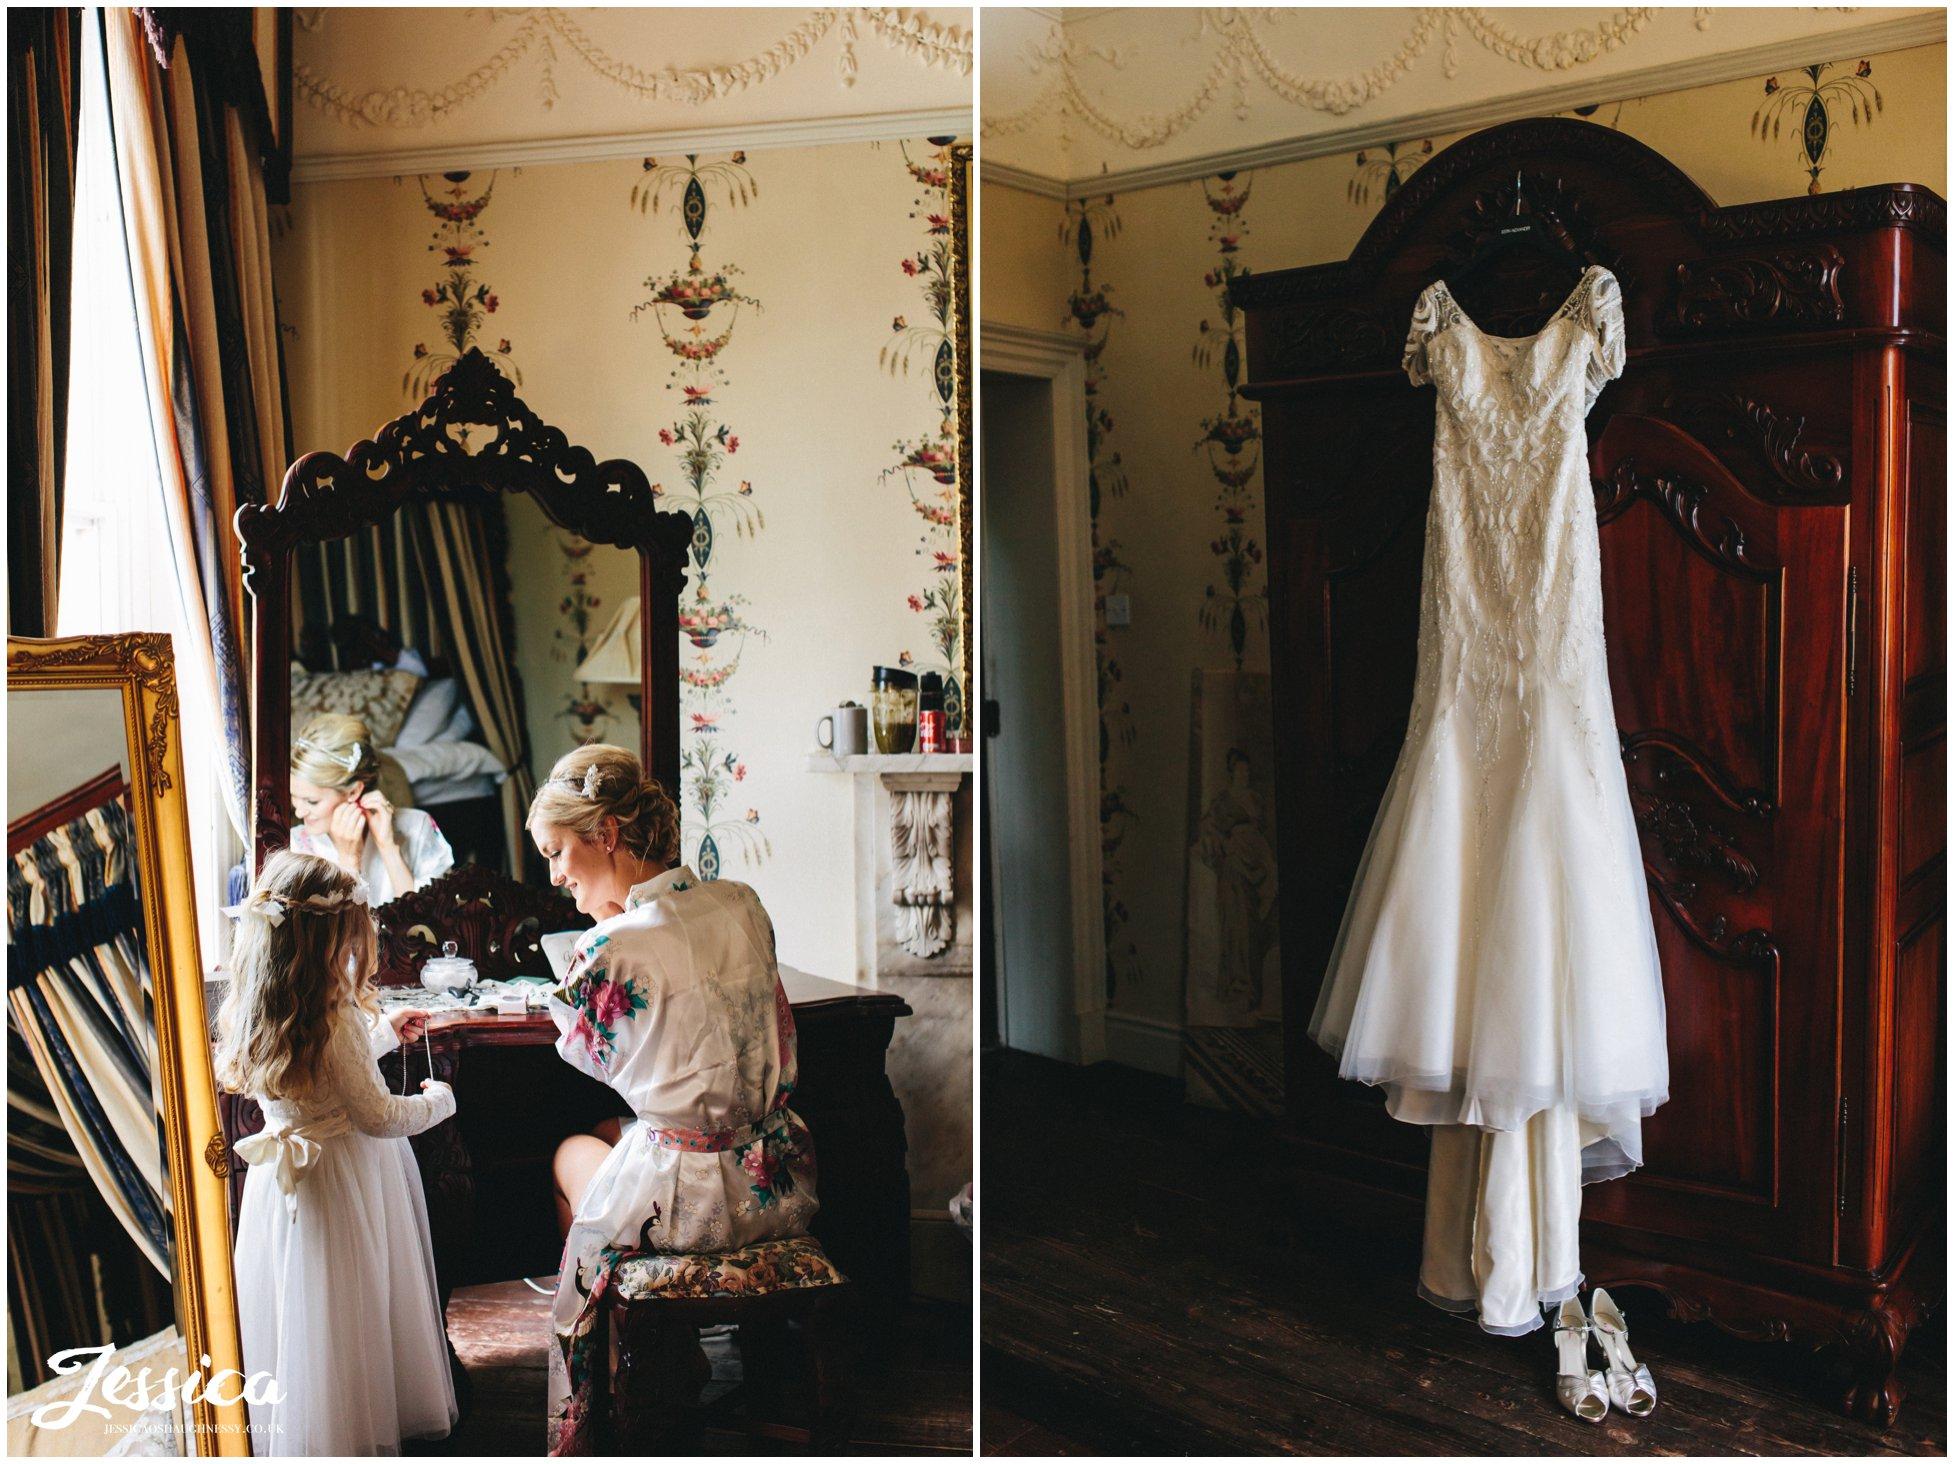 trevor hall wedding photography - wedding dress hanging from wardrobe